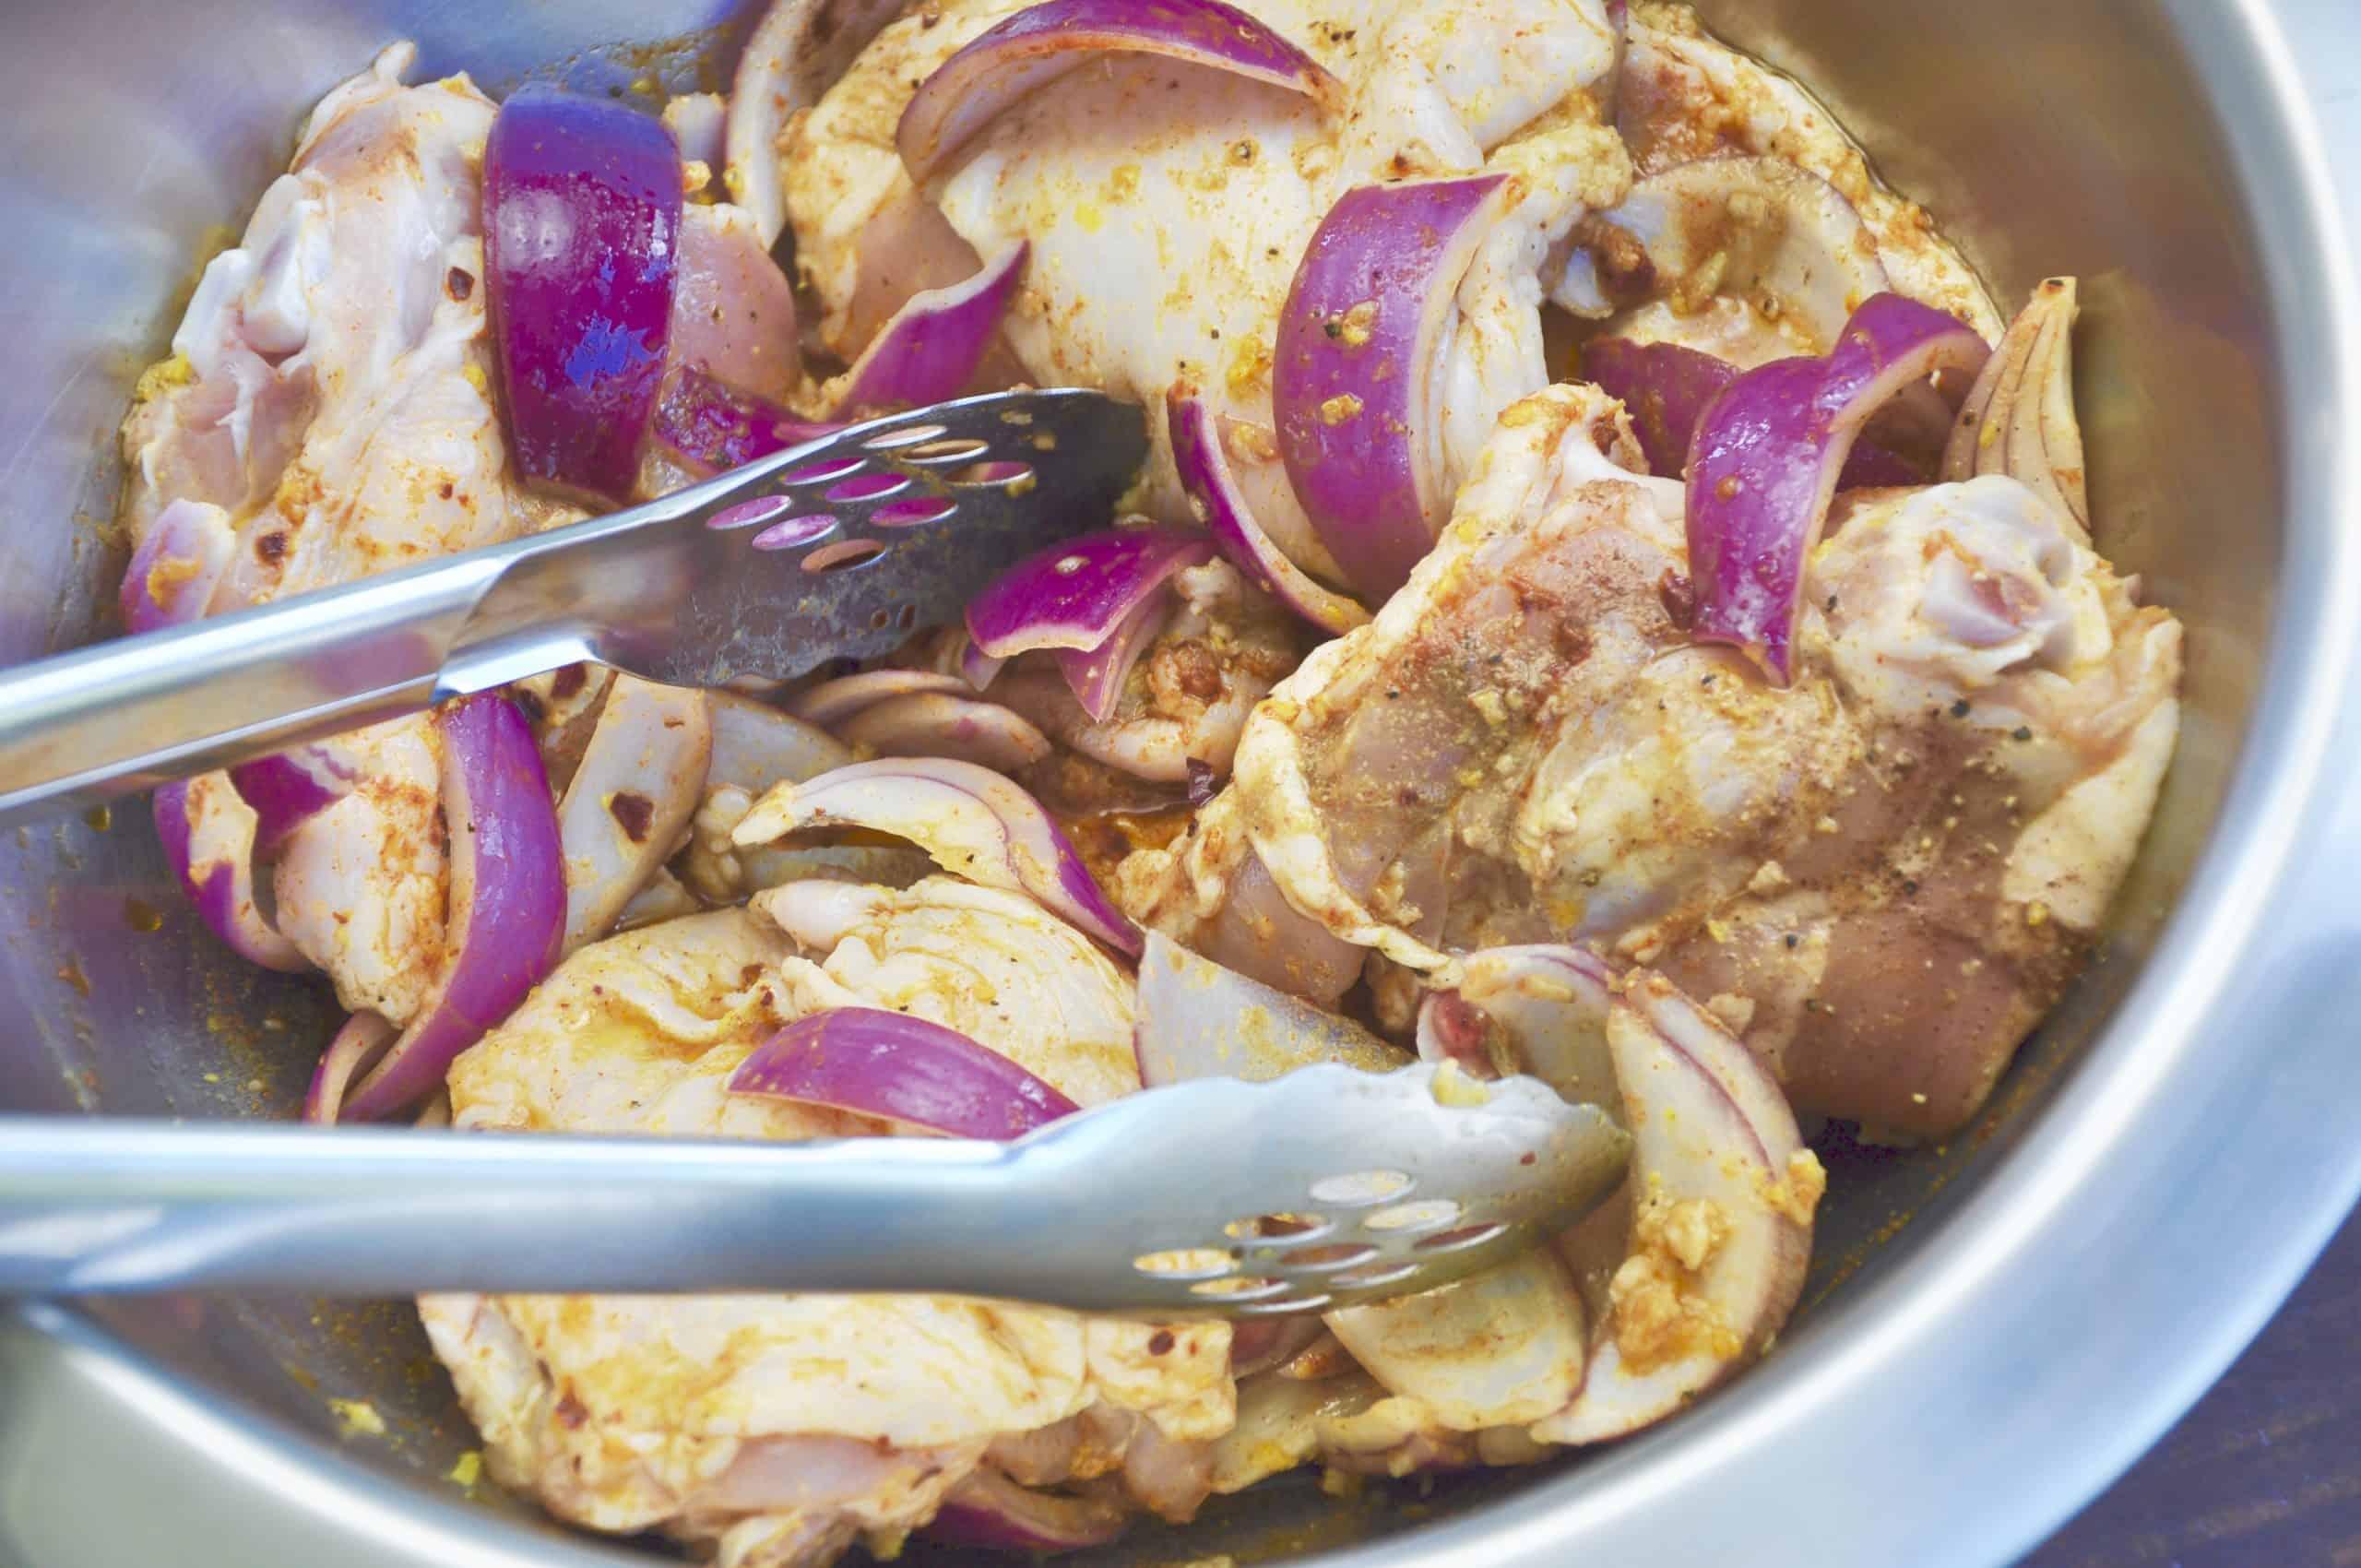 chicken shawarma marinade ingredients in a bowl with fresh chicken being added